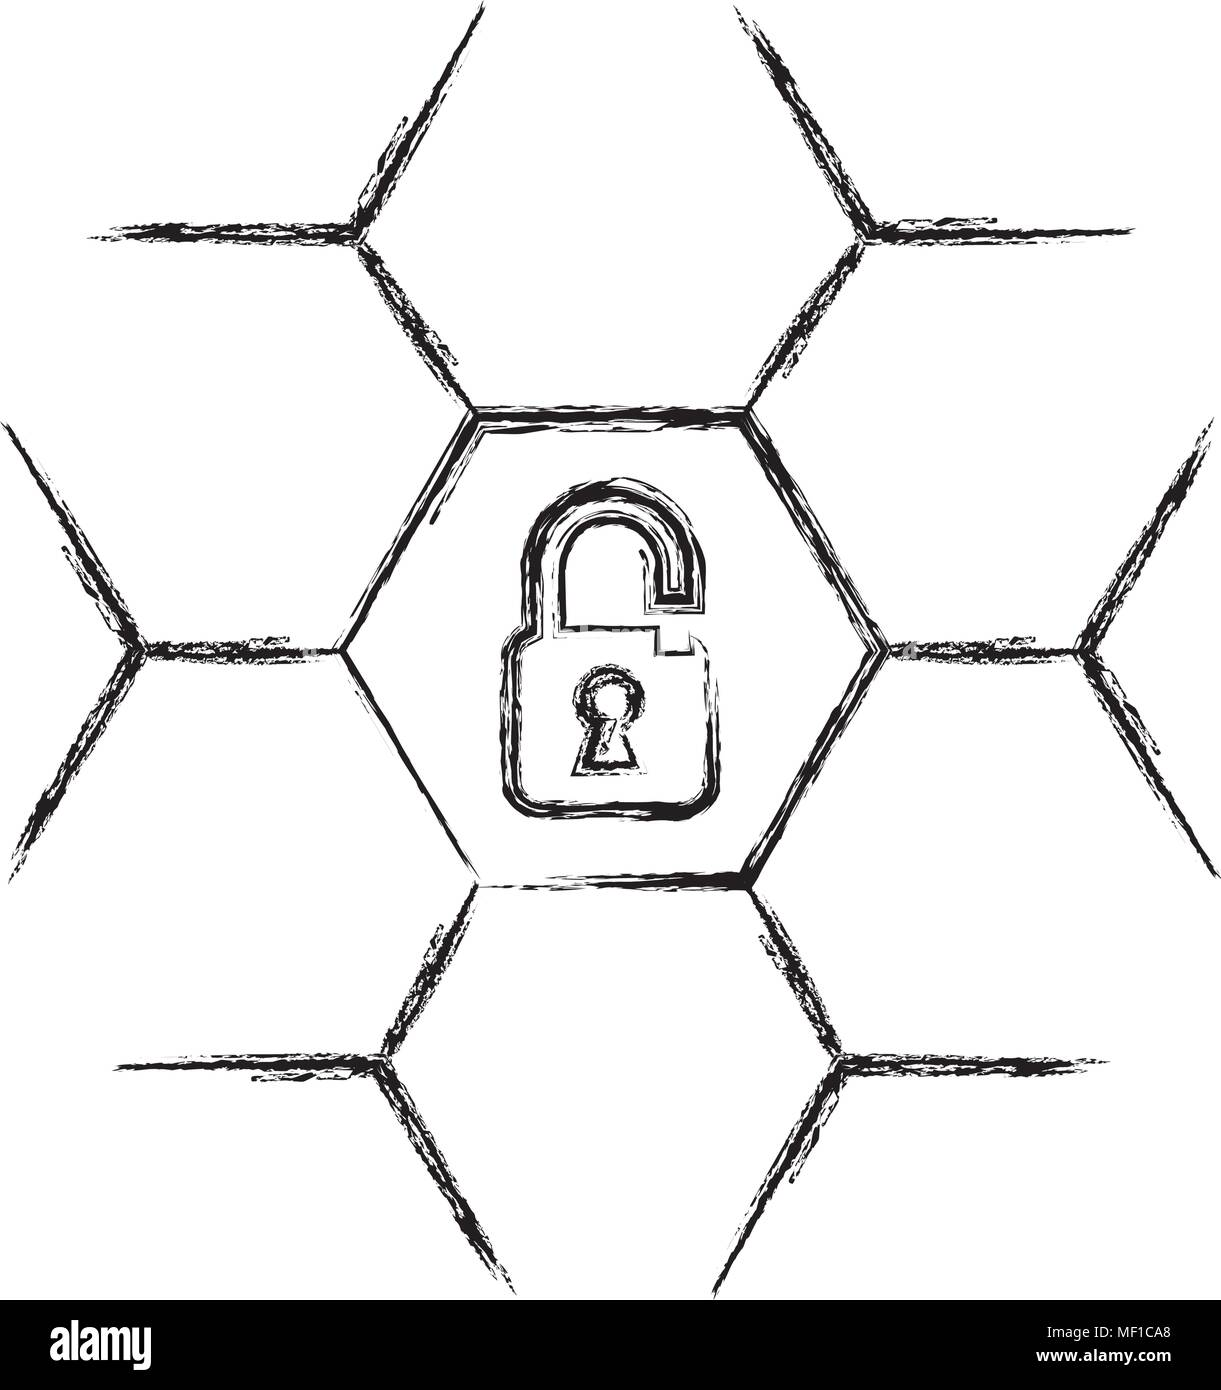 safe secure padlock icon - Stock Image